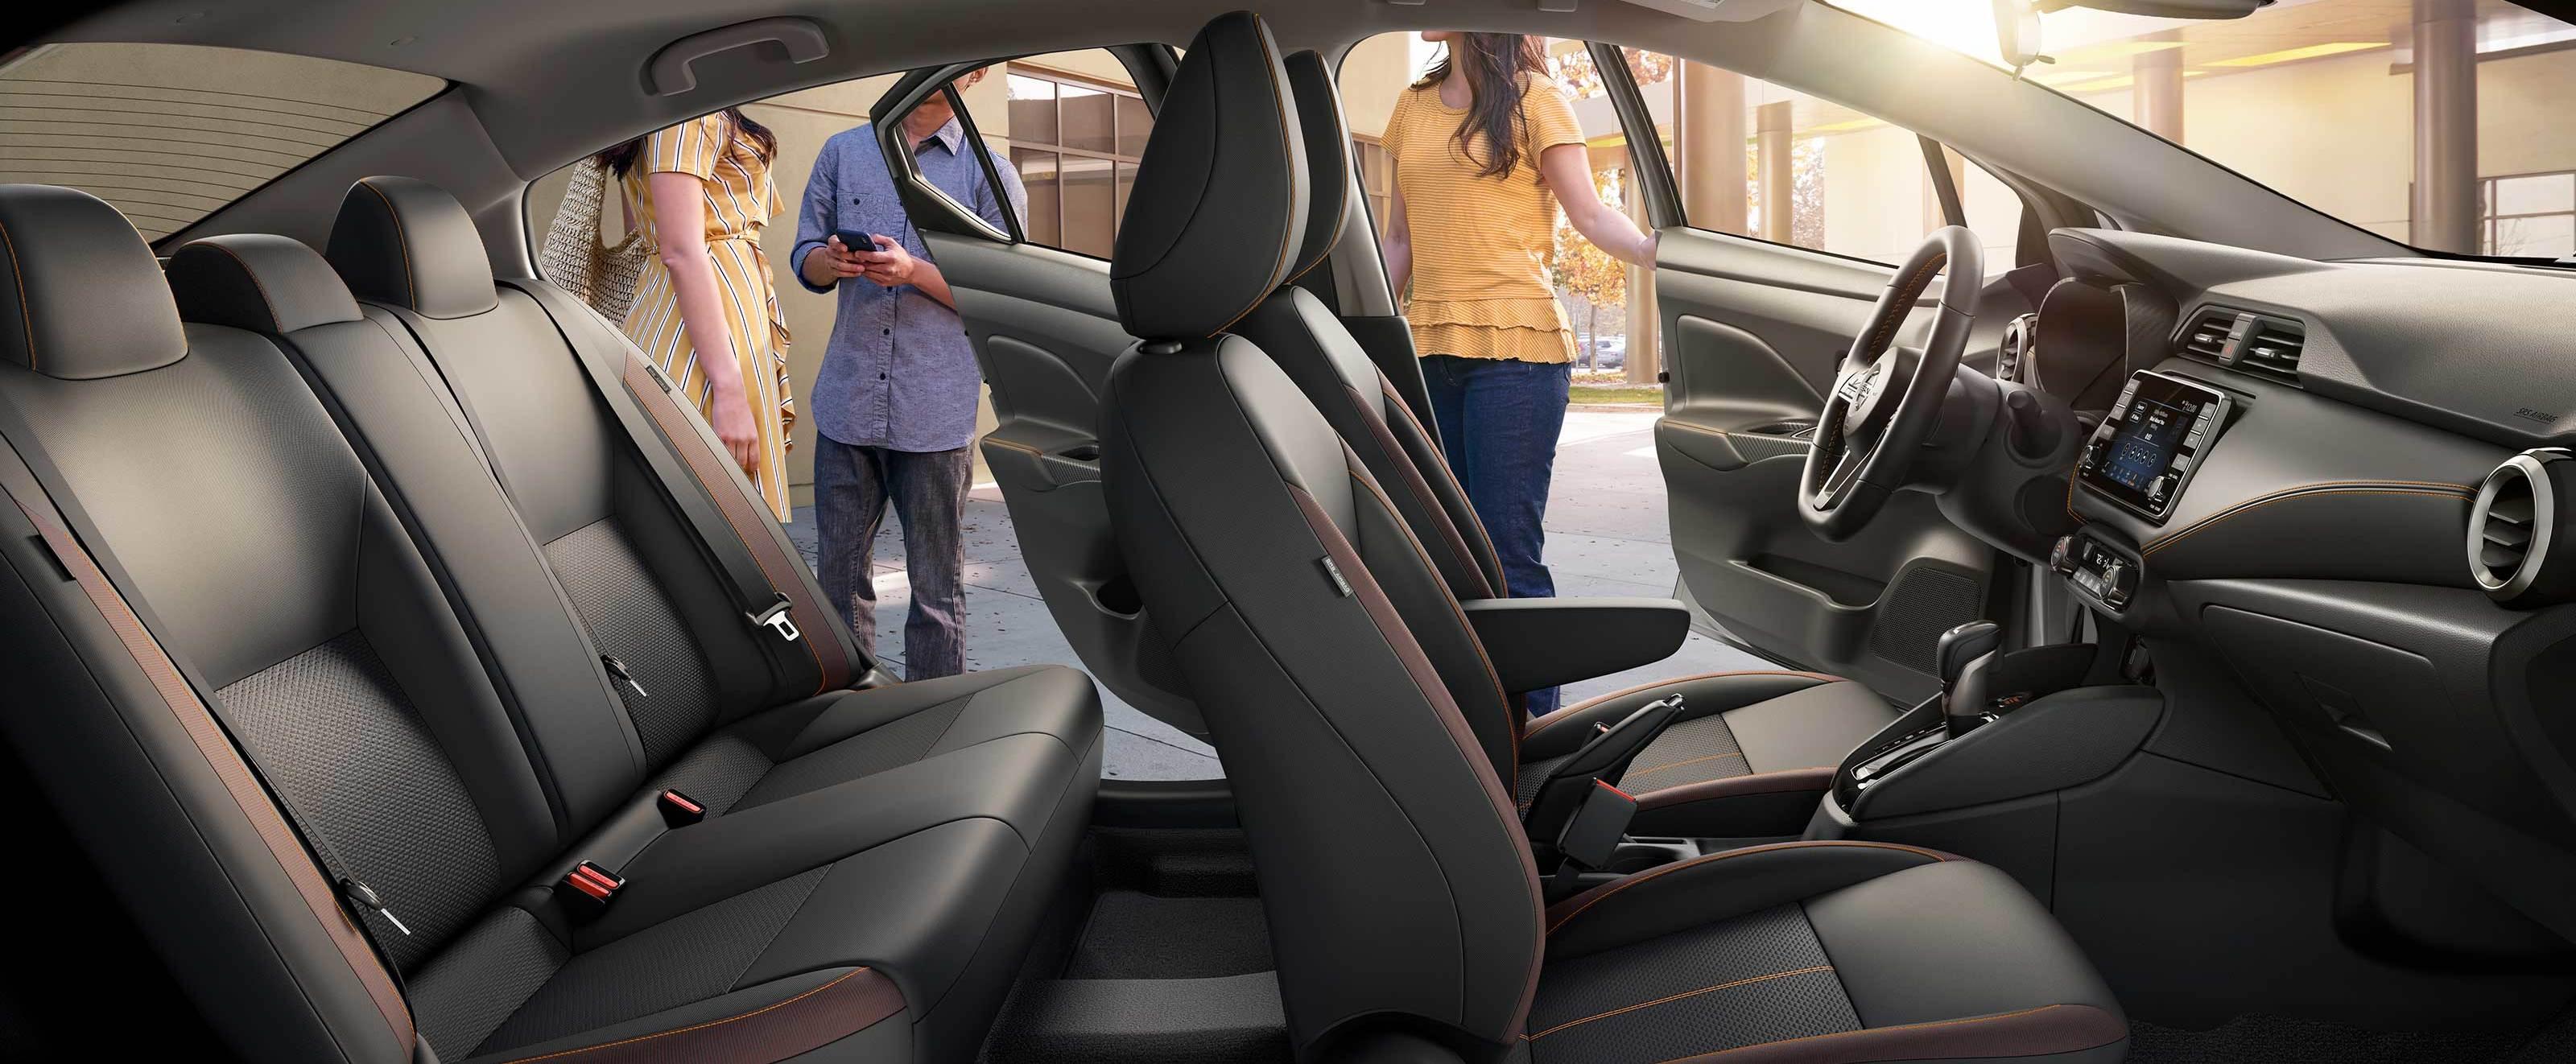 2020 Nissan Versa Spacious Interior